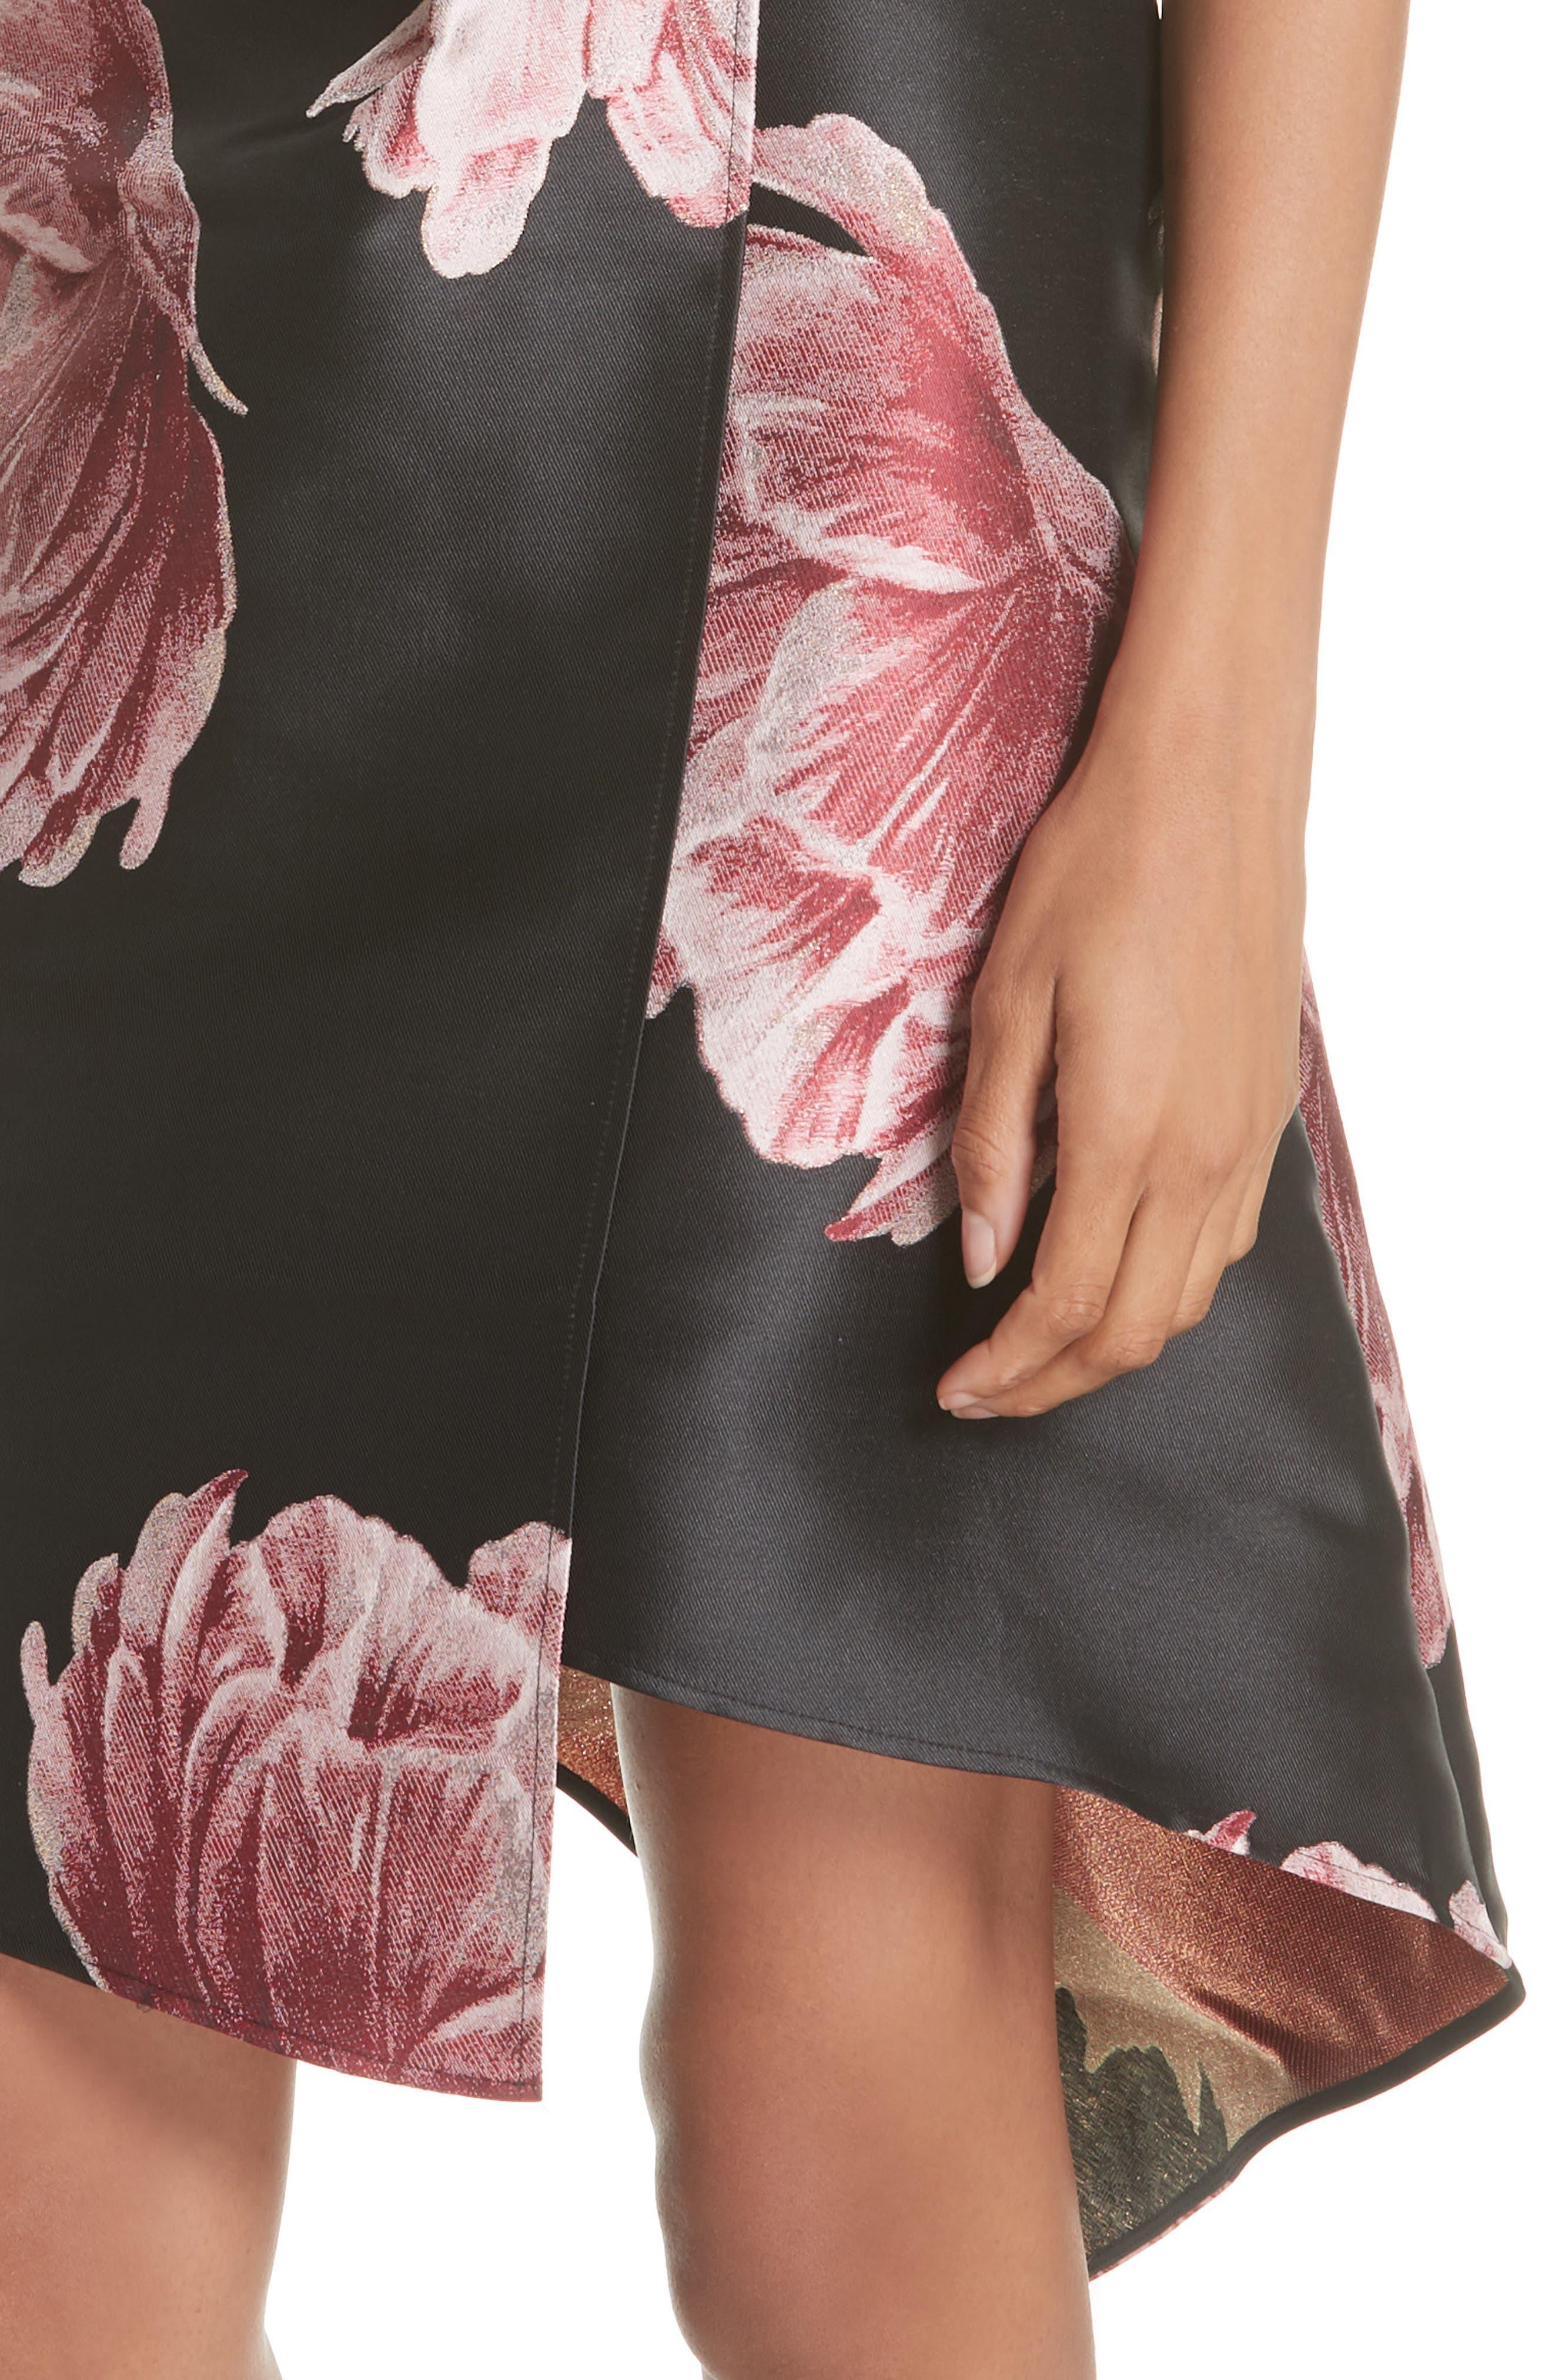 Eyvii Bay of Honour Asymmetrical Dress,                             Alternate thumbnail 4, color,                             001